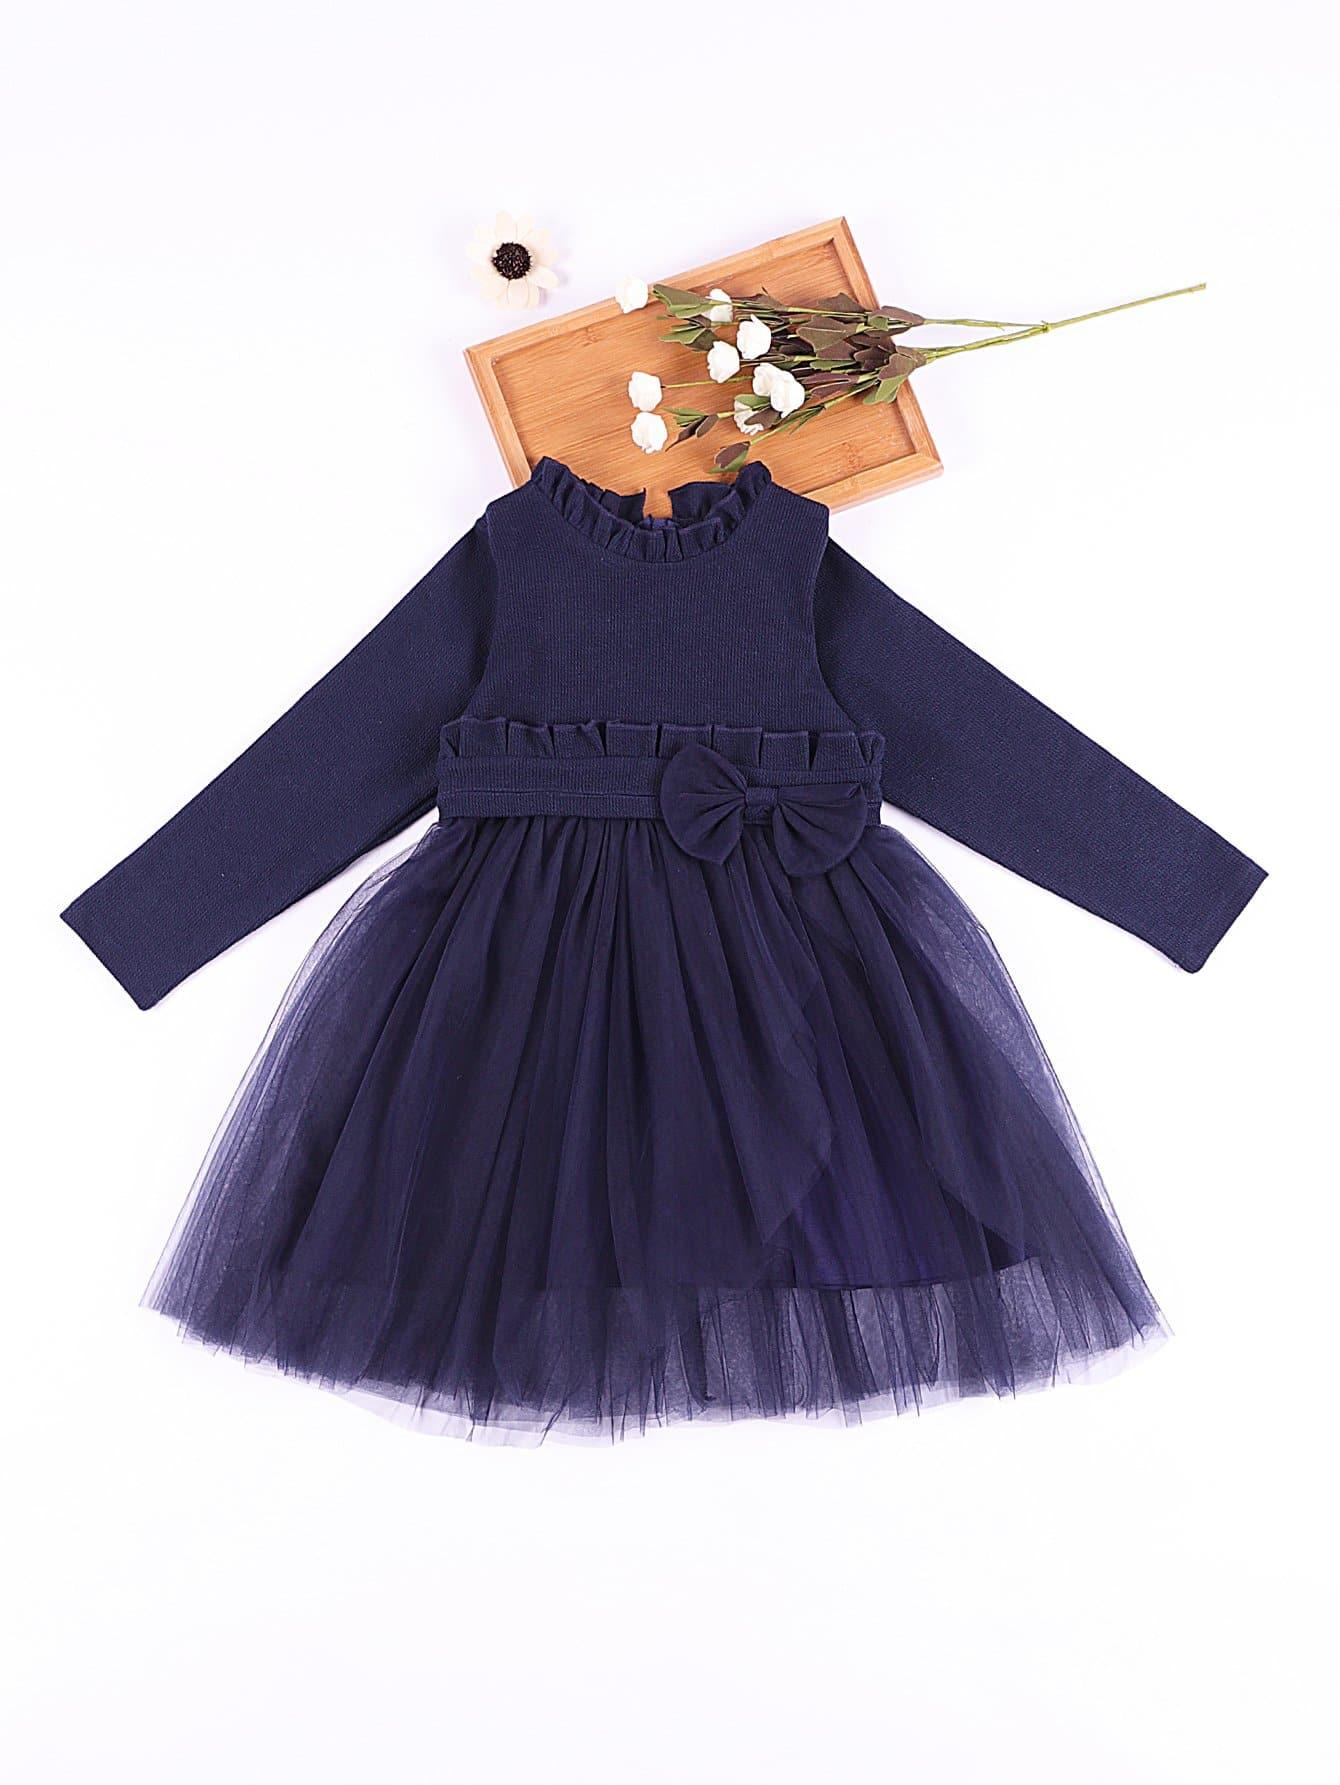 Girls Frill Trim Bow Detail Layered Mesh Dress girls embroidery detail frill trim blouse